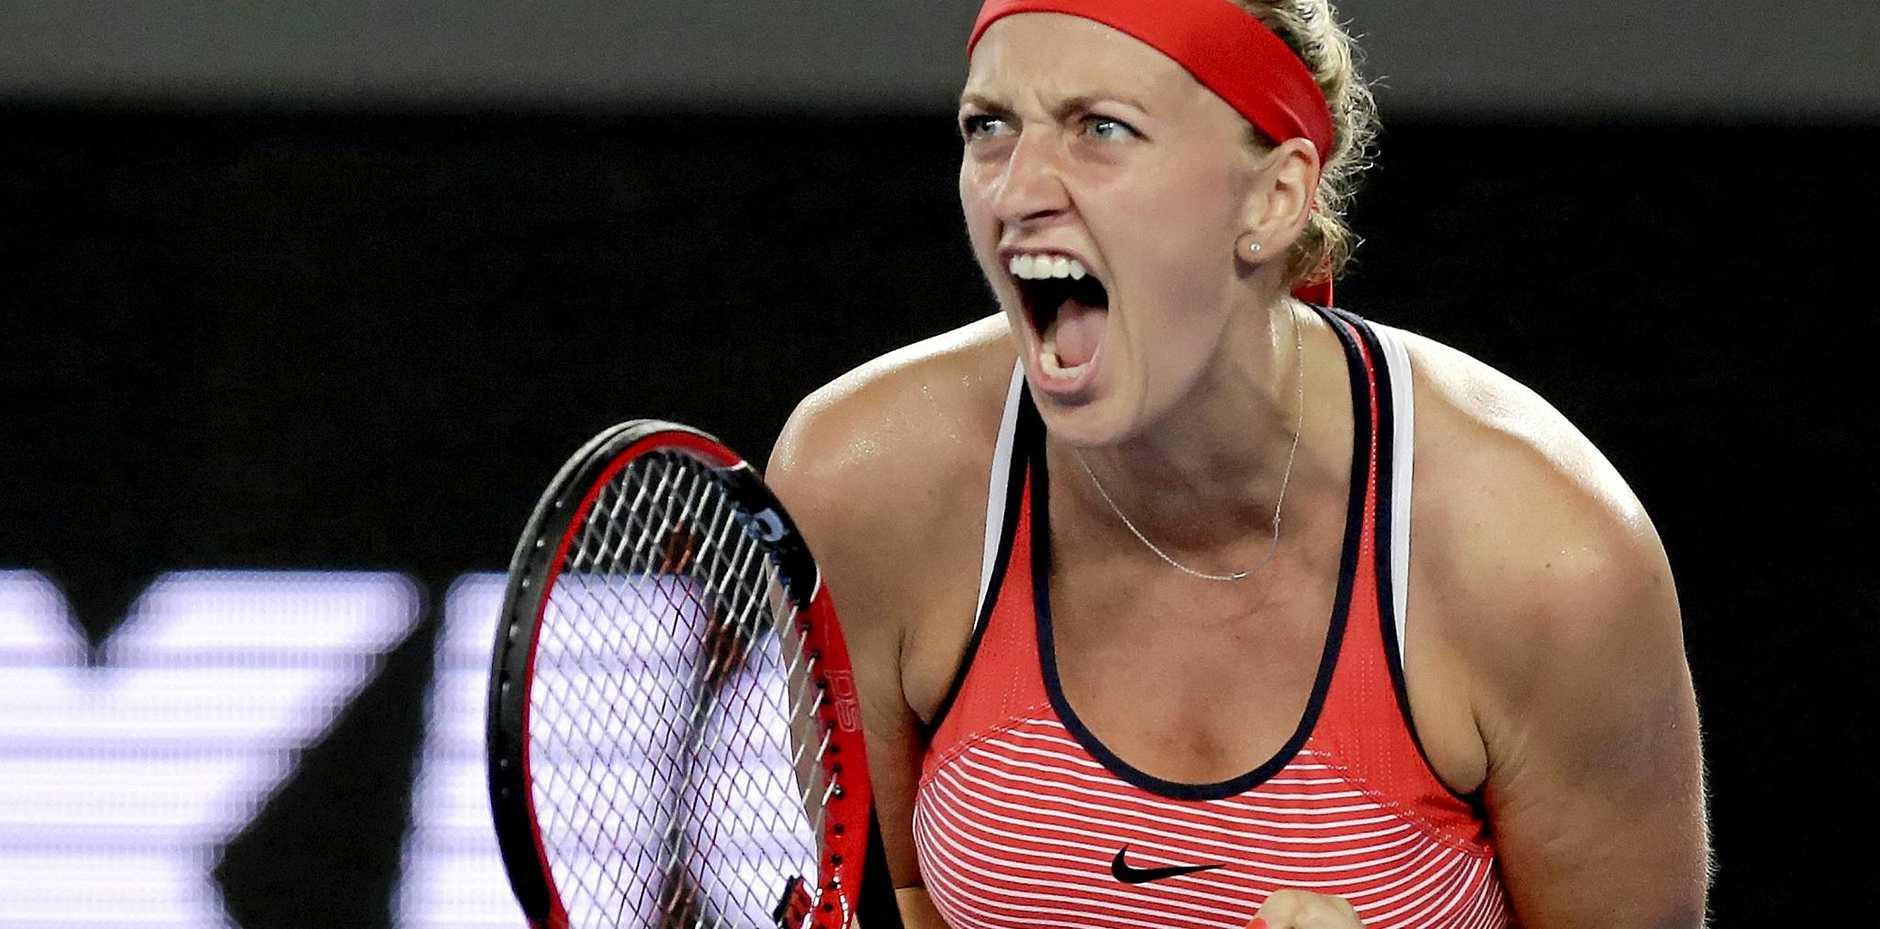 Tennis star Petra Kvitova of the Czech Republic.